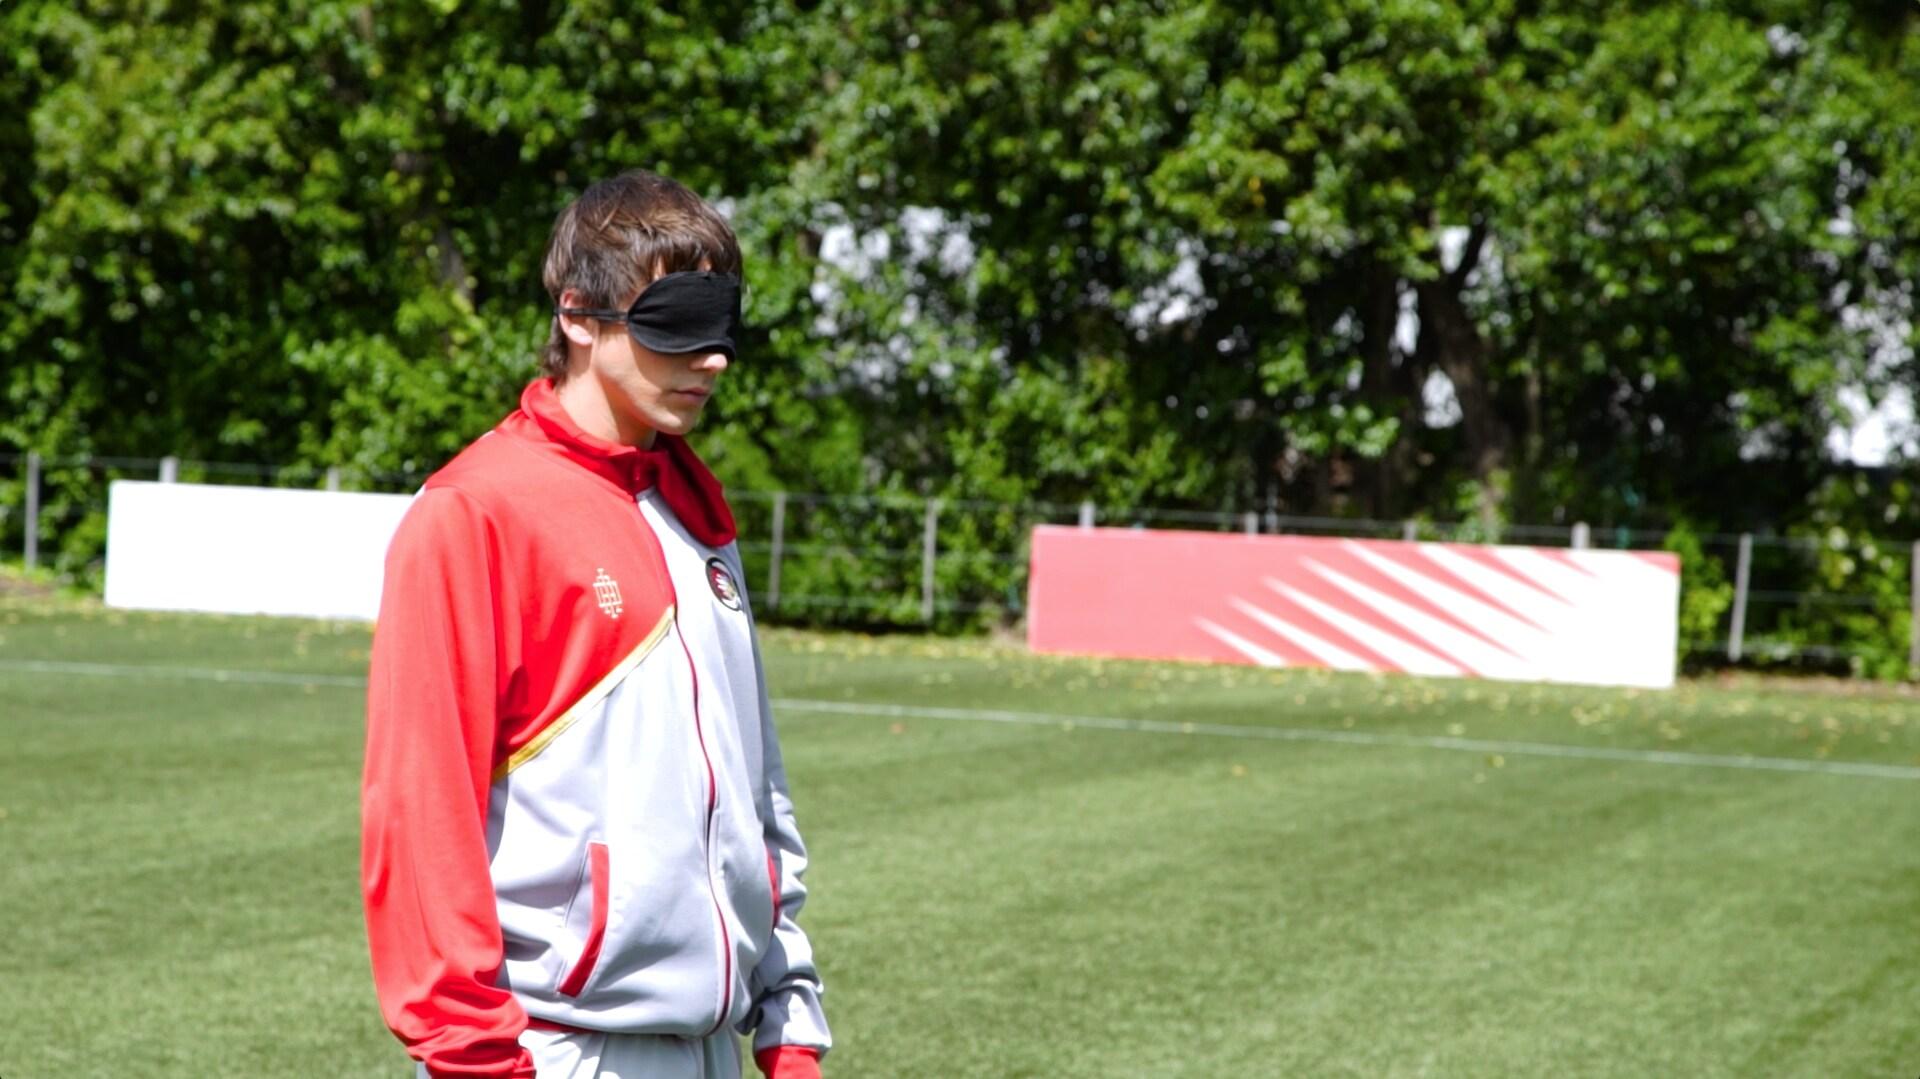 O11CE Challenges: Tiros ciegos – Lorenzo vs. Gabo